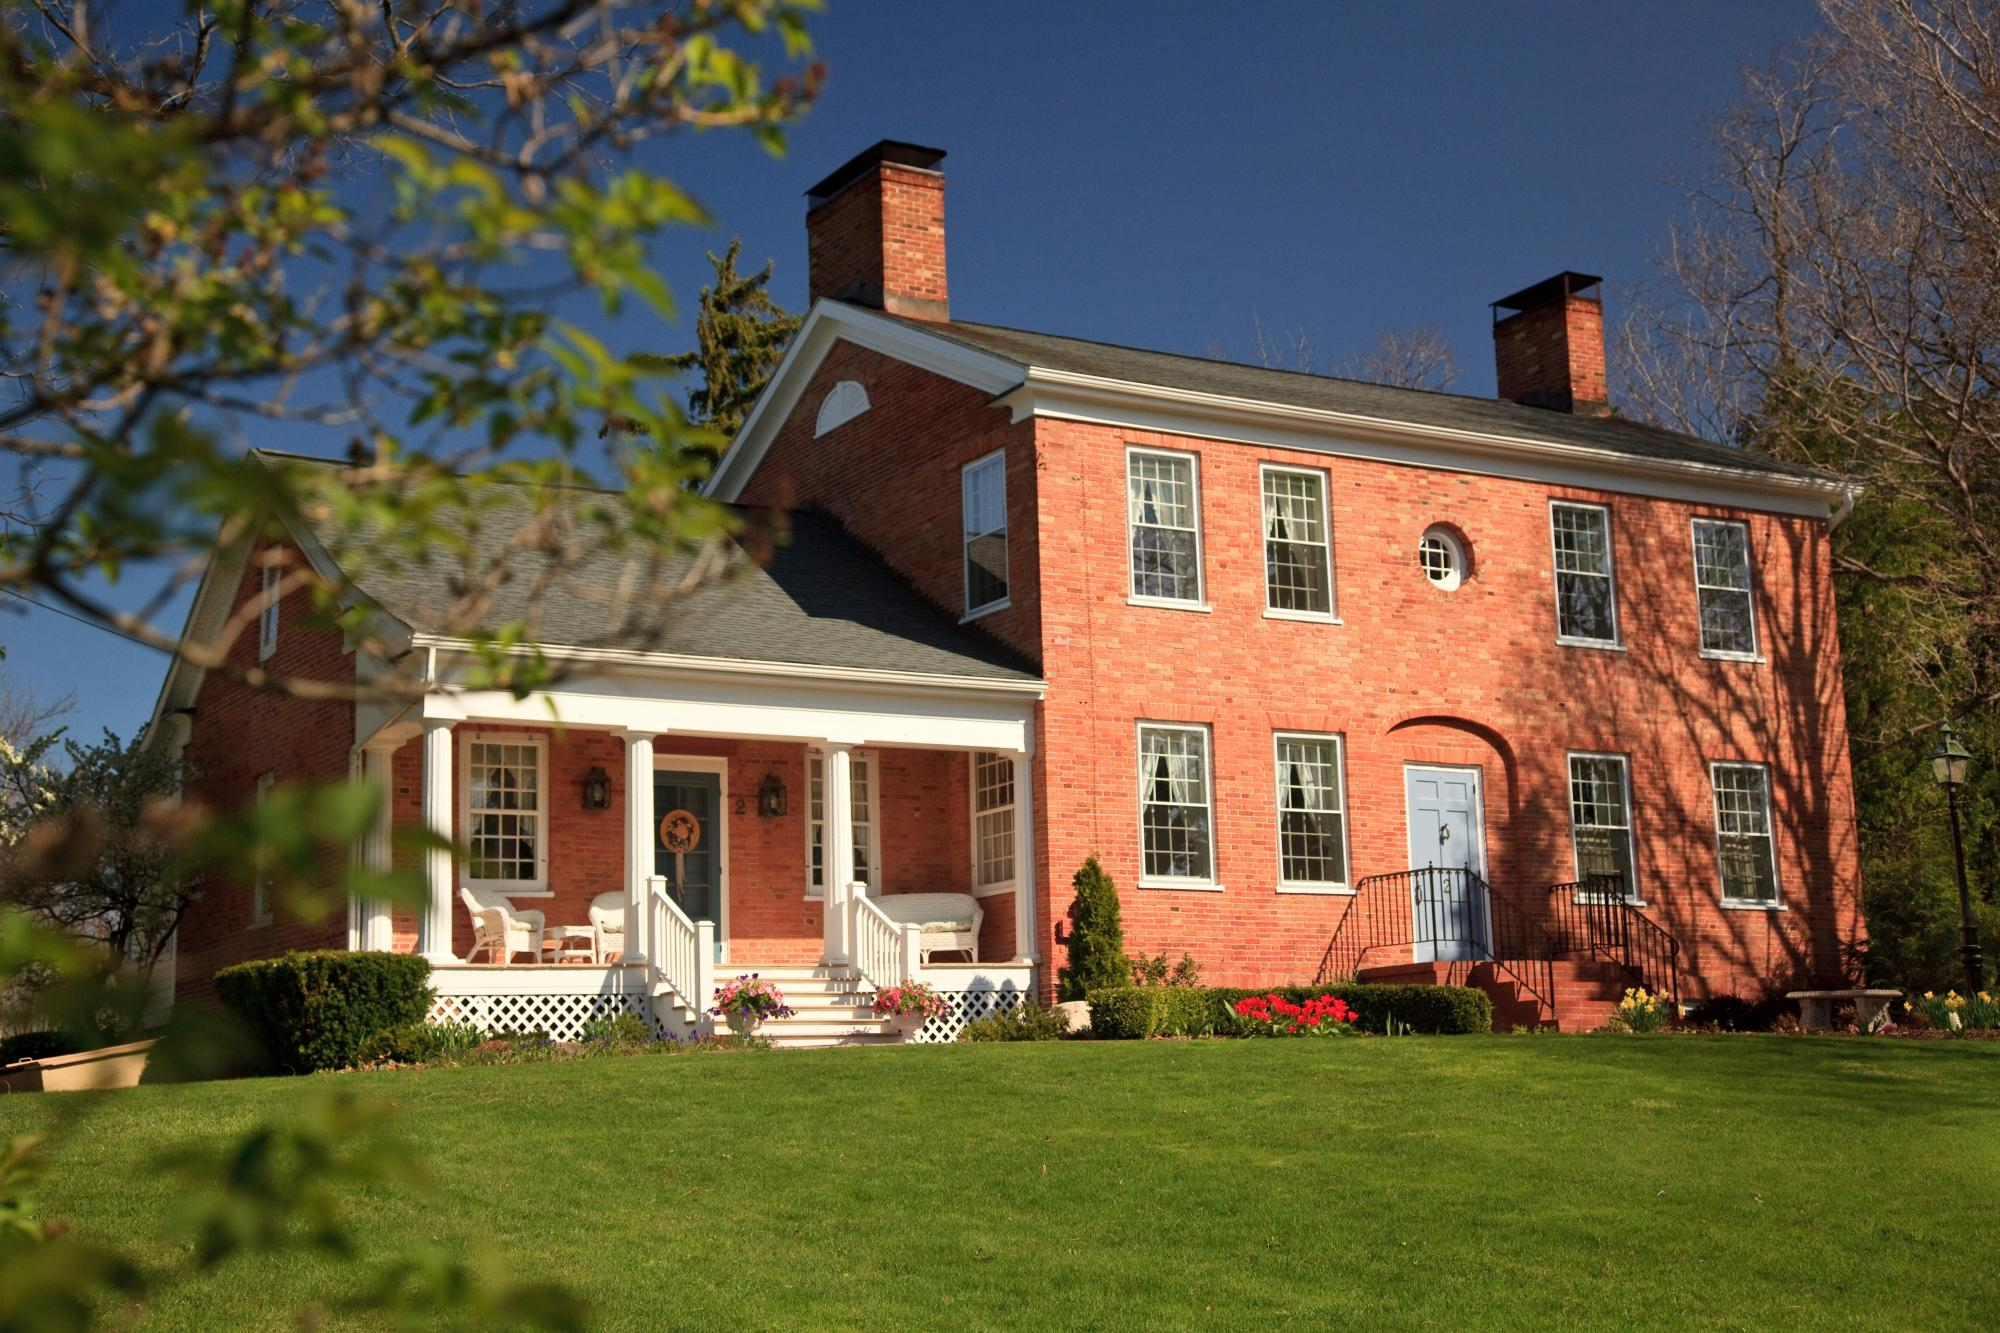 Abner Adams House Bed & Breakfast Inn